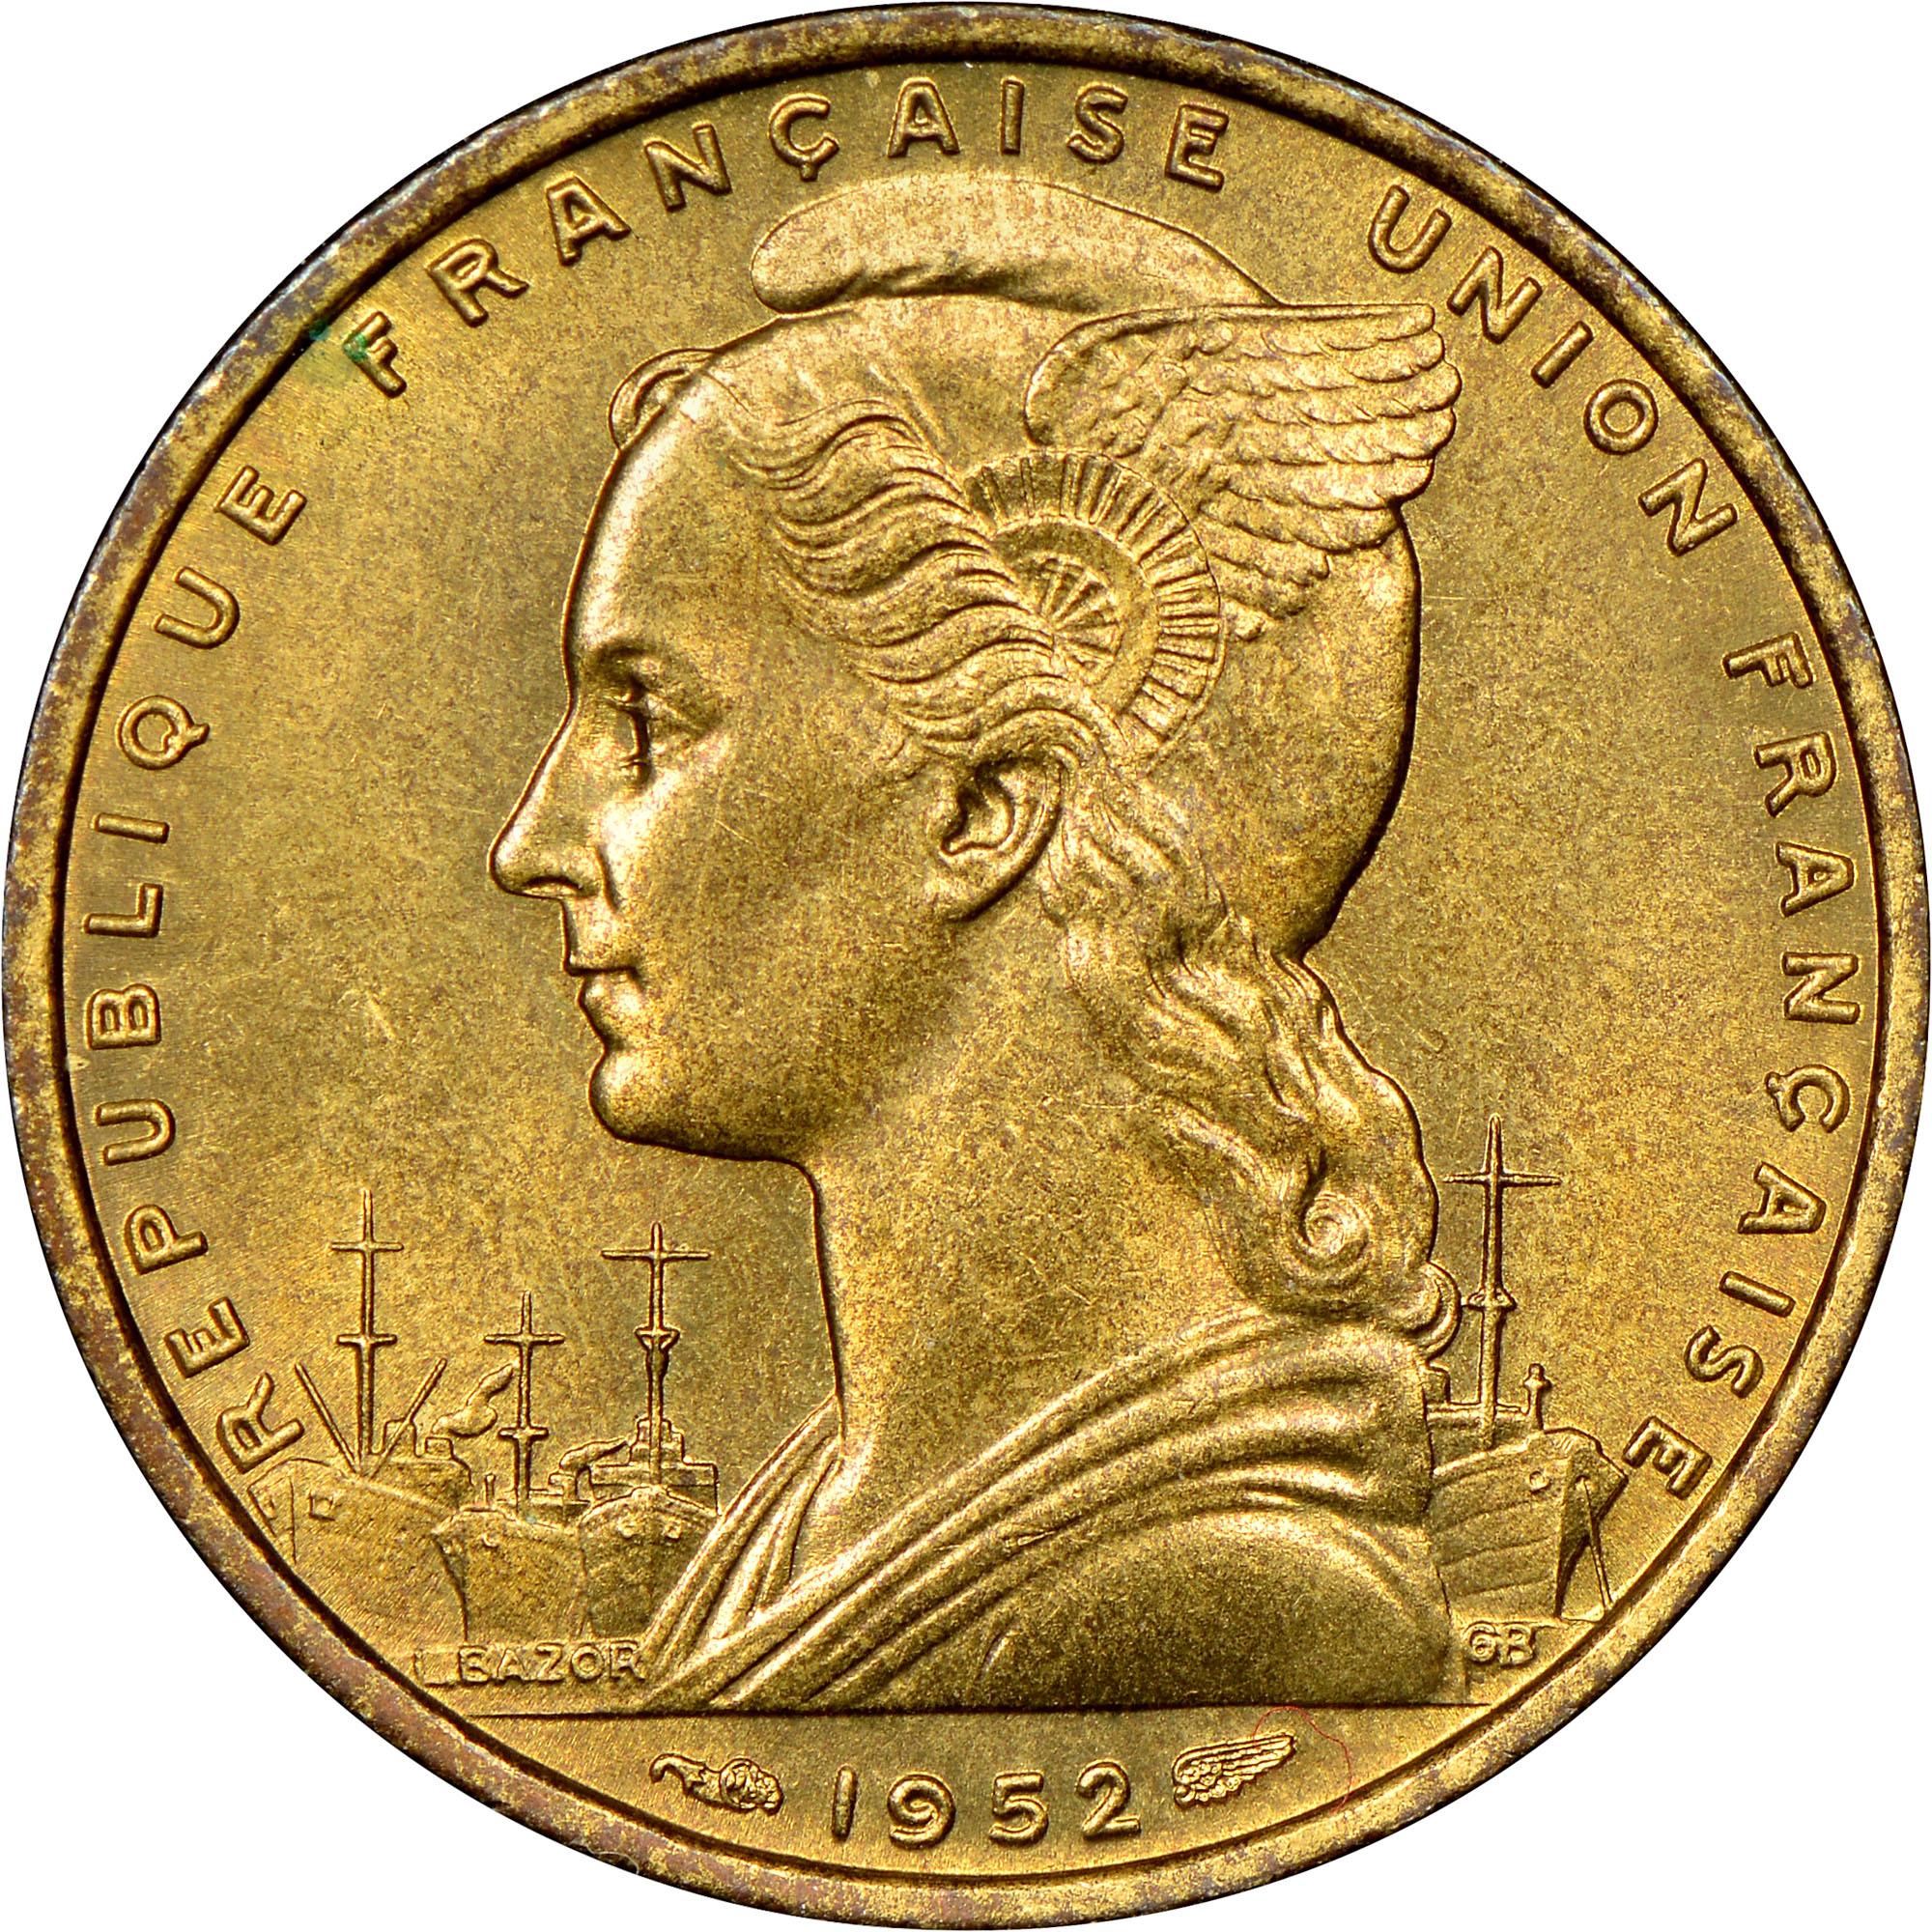 French Somaliland 20 Francs obverse